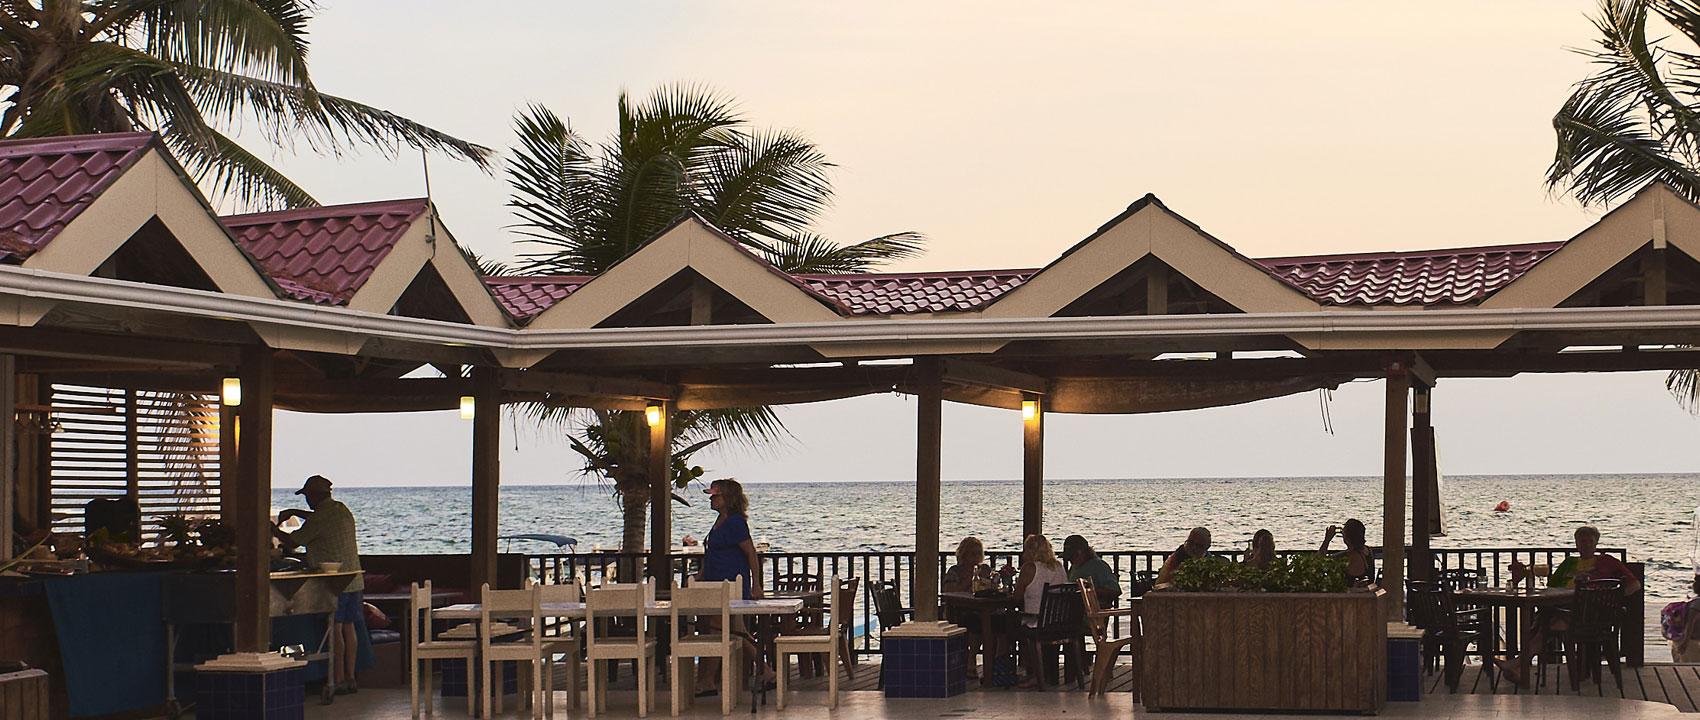 San Pedro Belize Dining